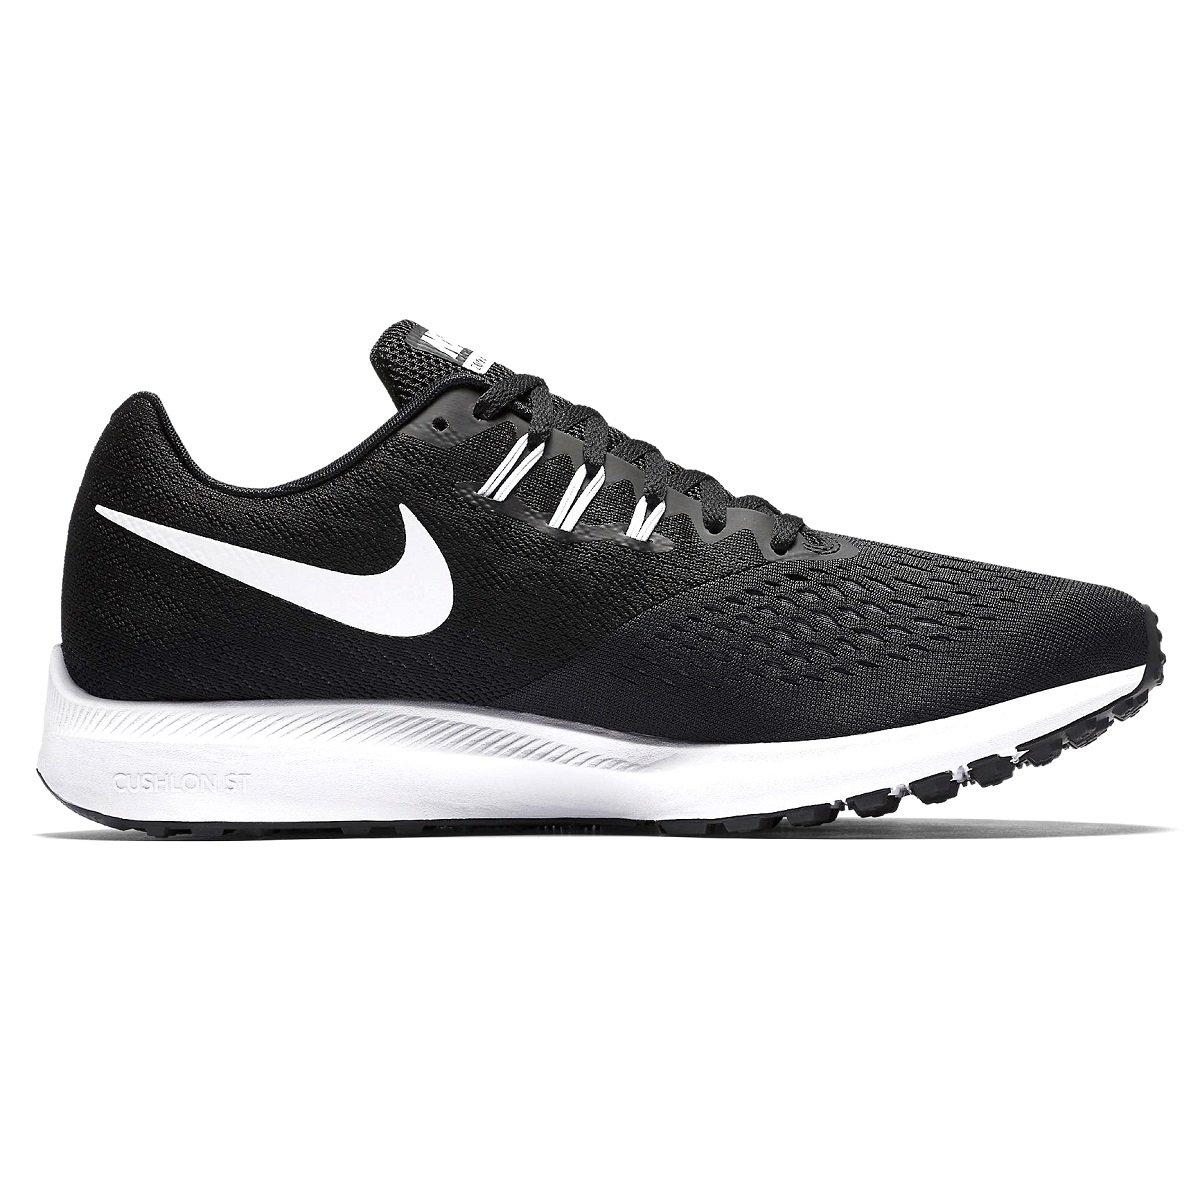 Tênis Masculino Nike Zoom Winflo 4 898466-001 - Preto Branco - Botas ... f60d1085819bf